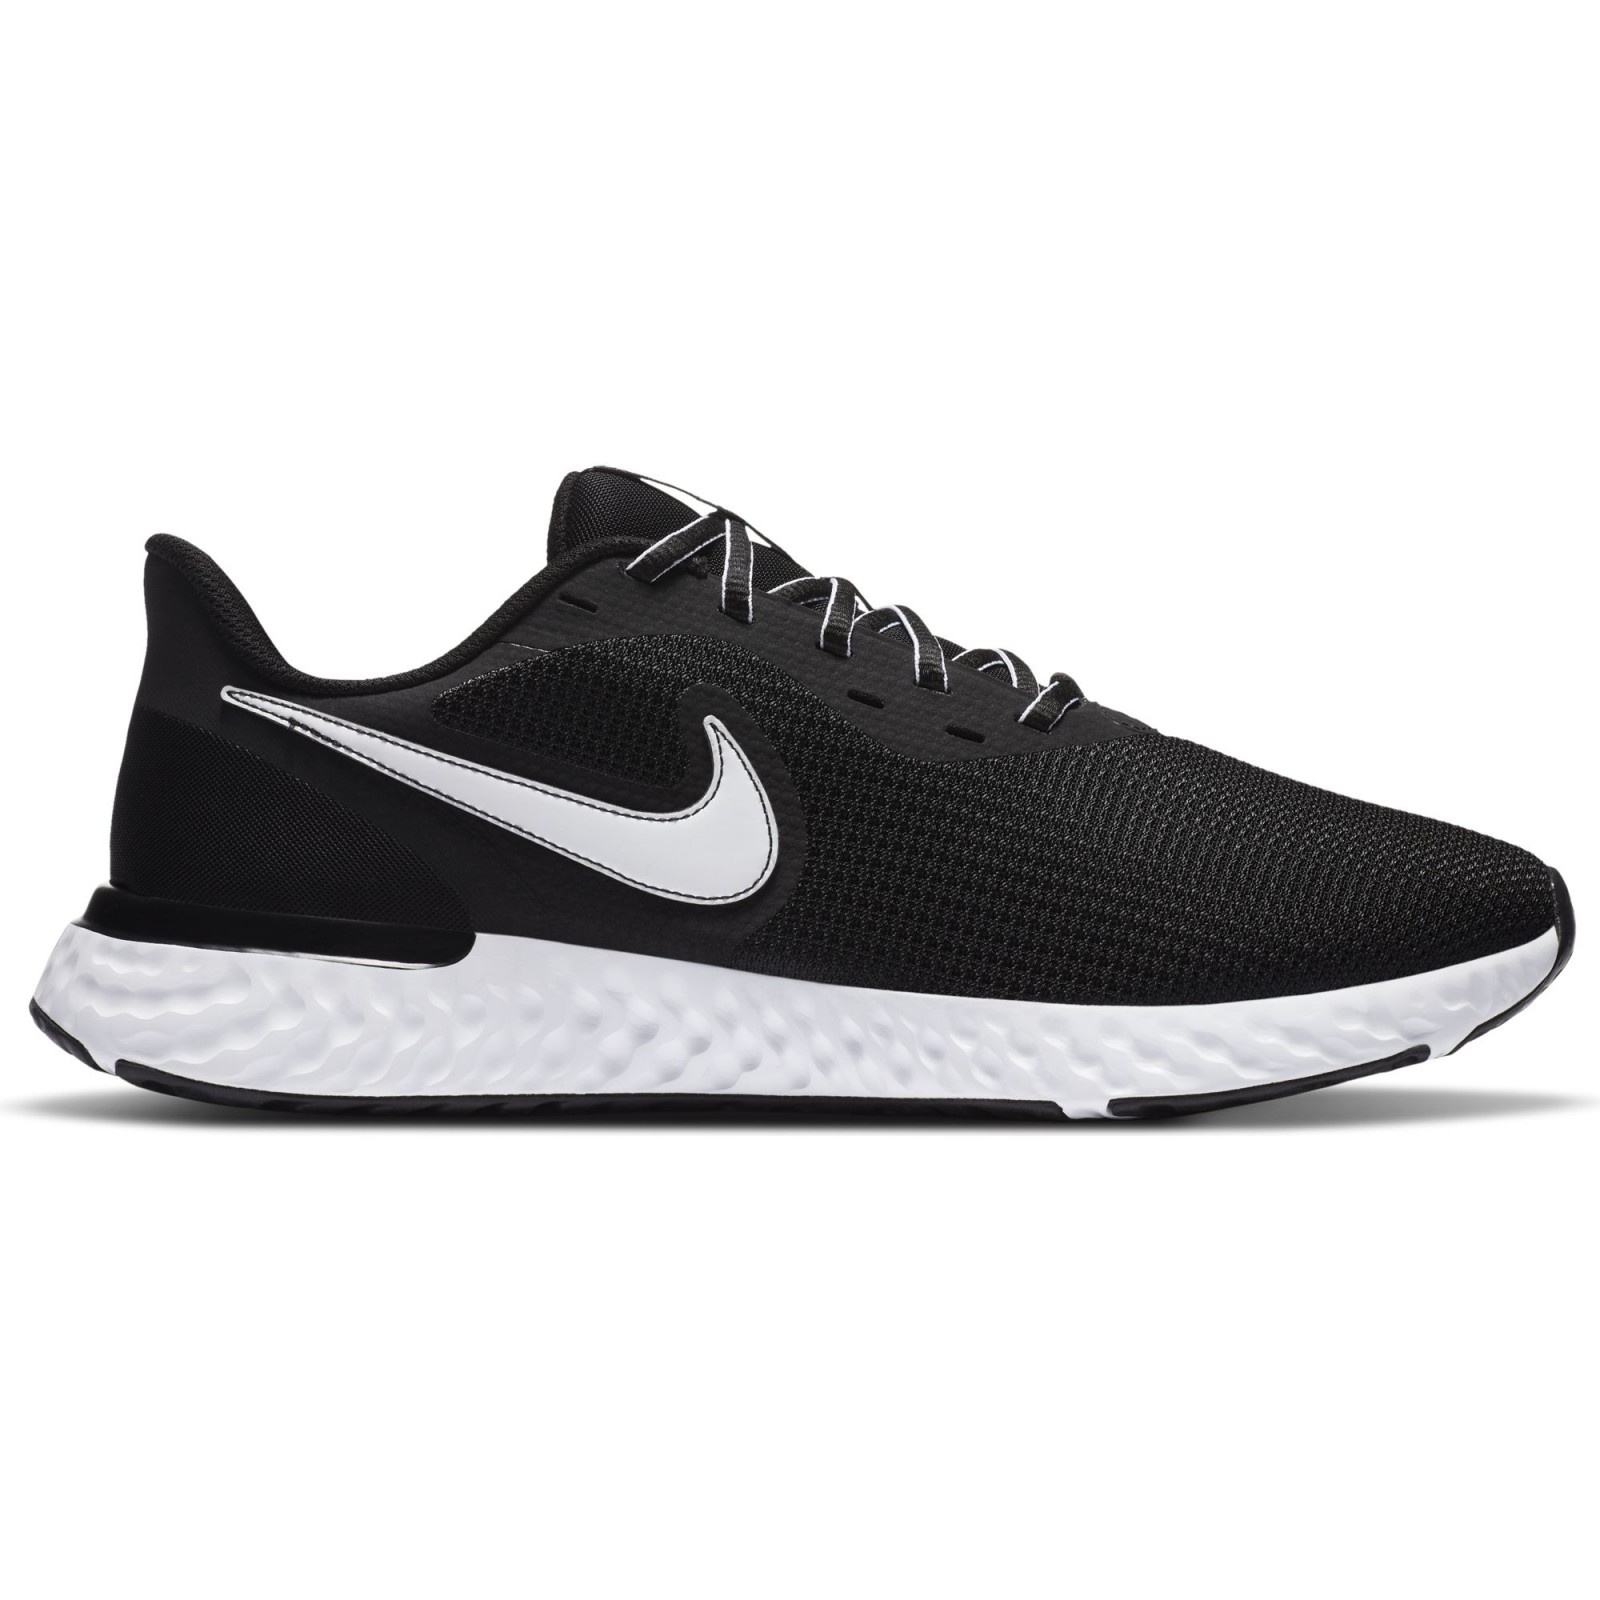 Nike Revolution 5 EXT BLACK/WHITE-DK SMOKE GREY